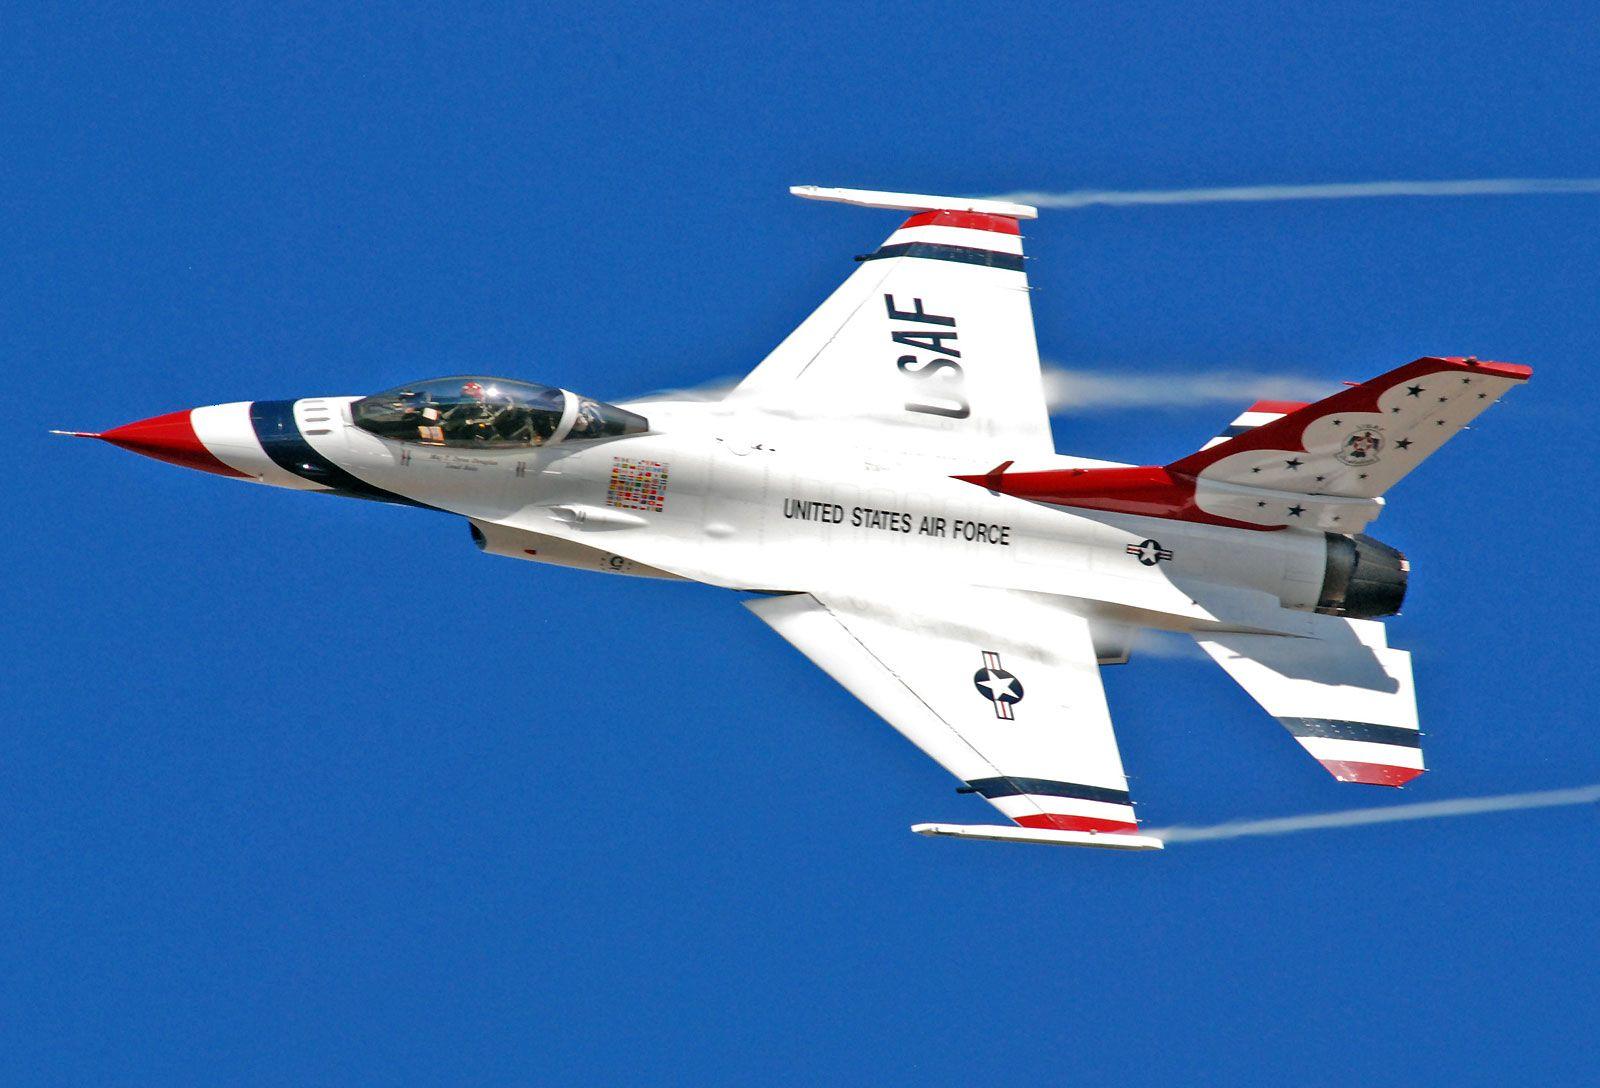 U.S. Air Force Thunderbirds 戦闘機, アメリカ空軍, 空軍